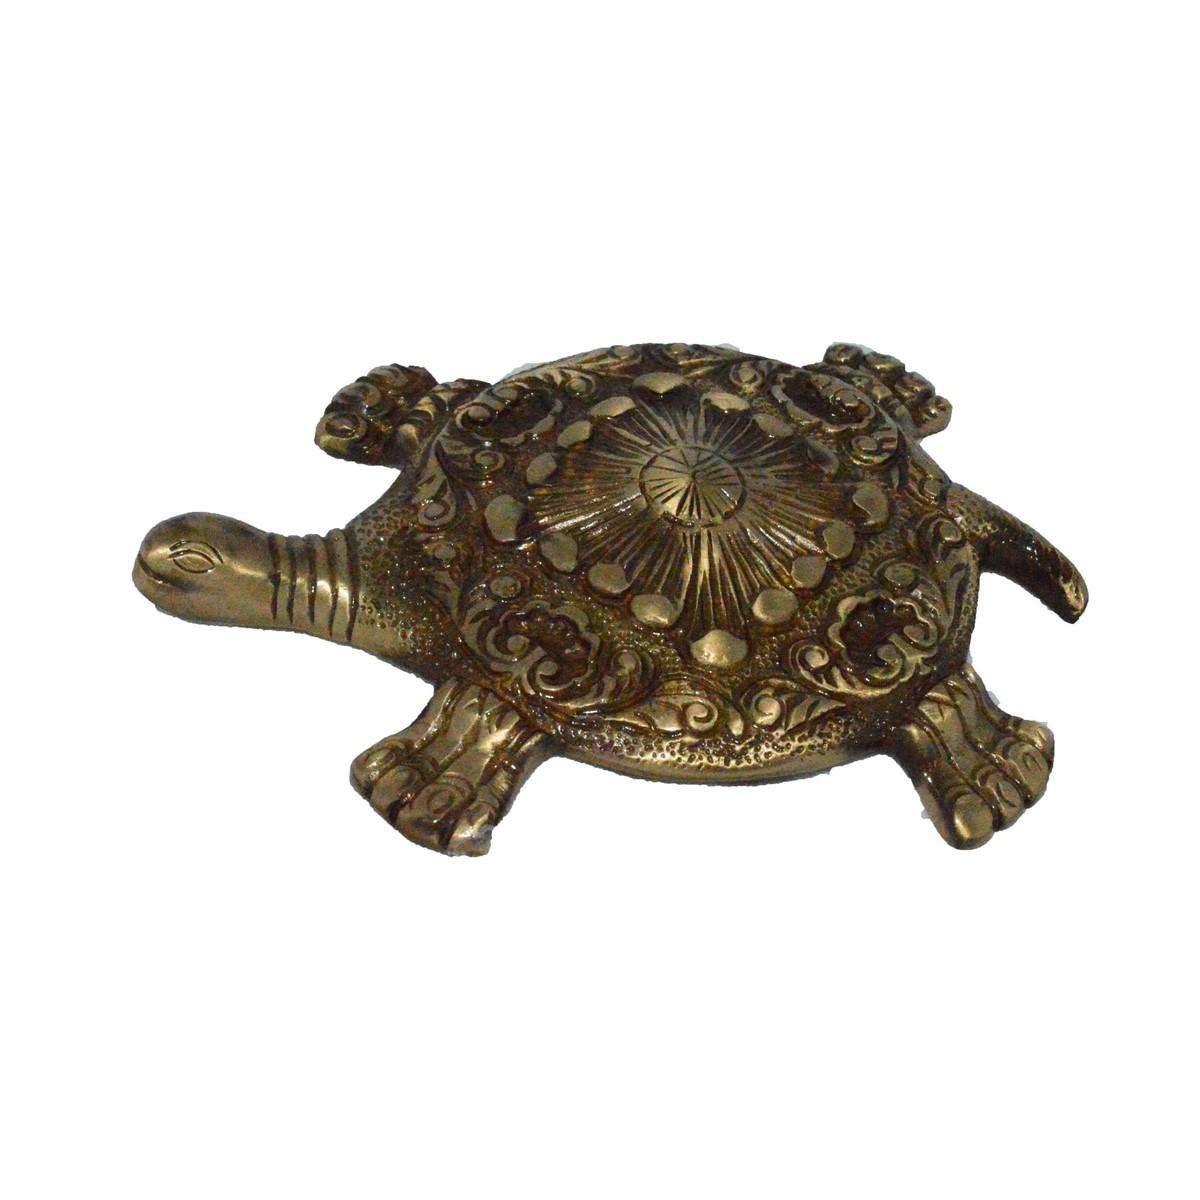 Brass Fend-Shui Tortoise Indian Home Decor